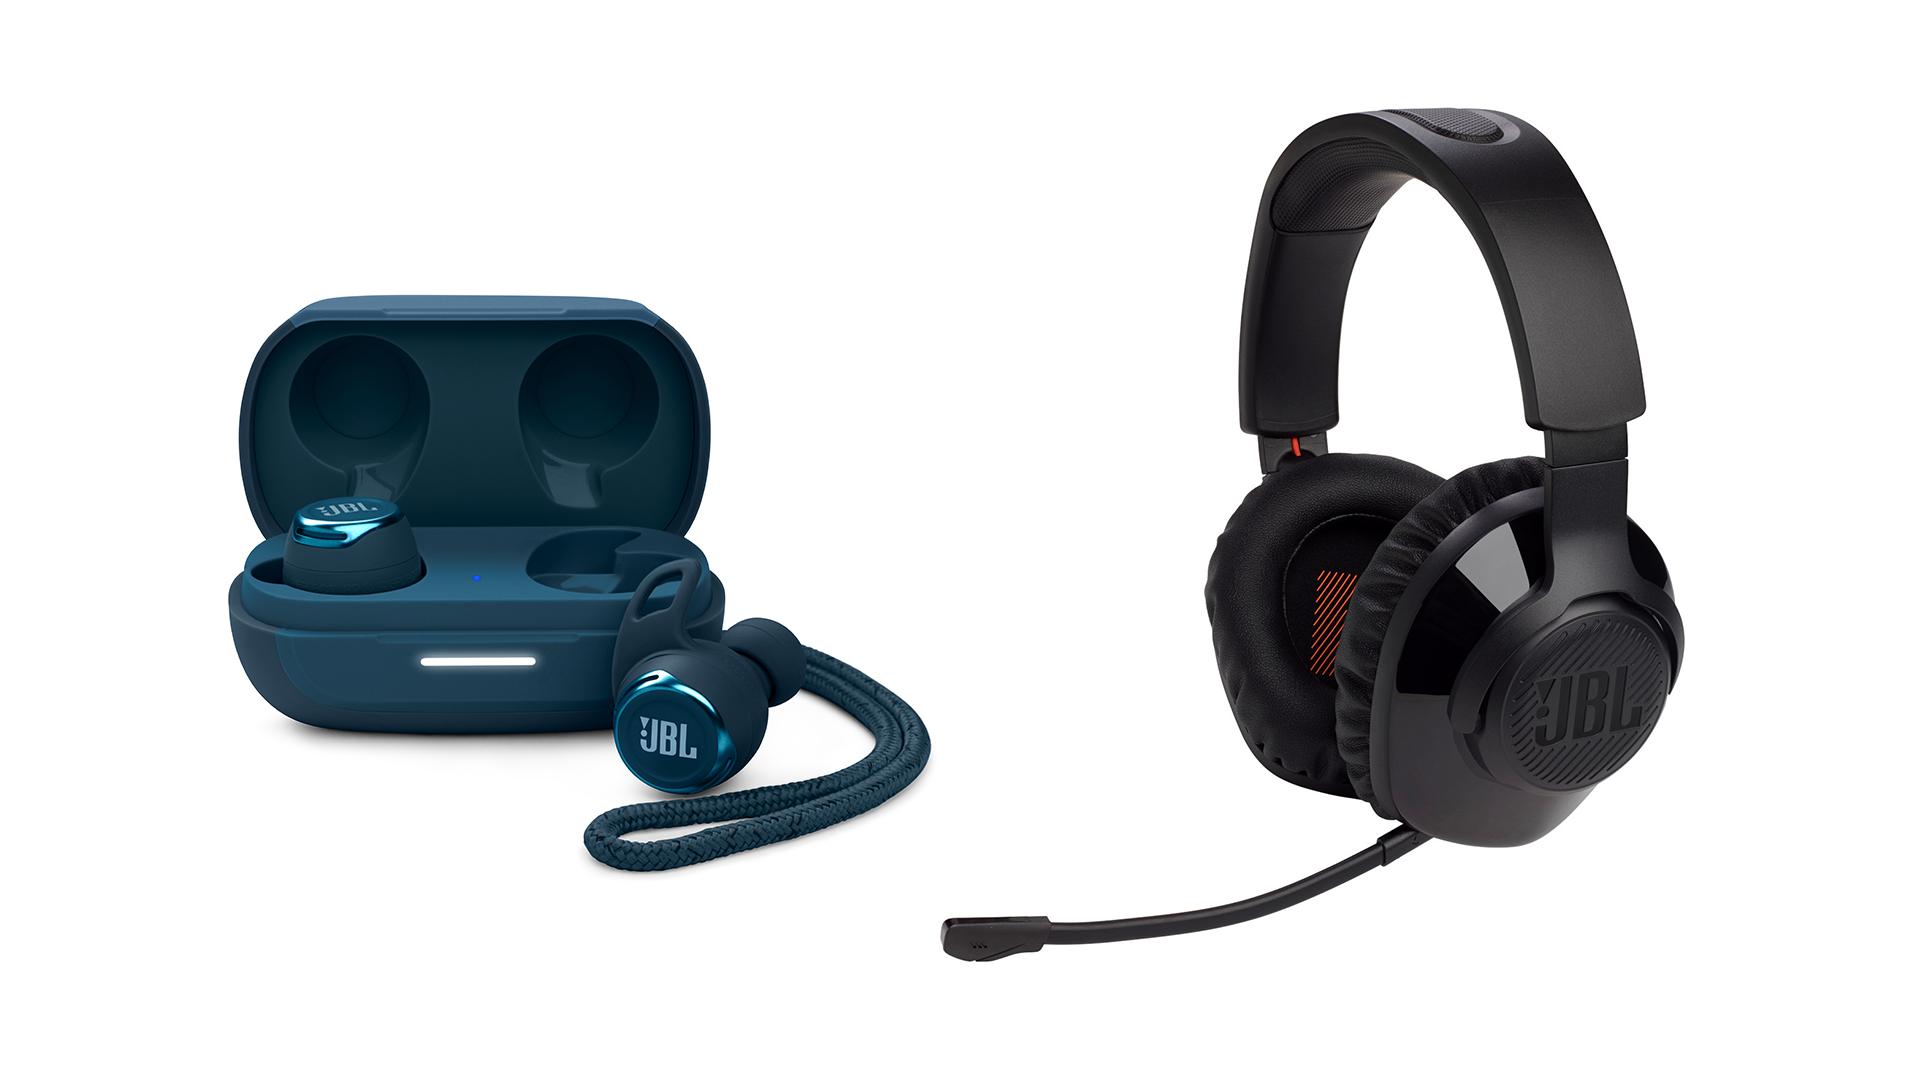 JBL Reflect Flow Pro earbuds and JBL Quantum 350 gaming headphones